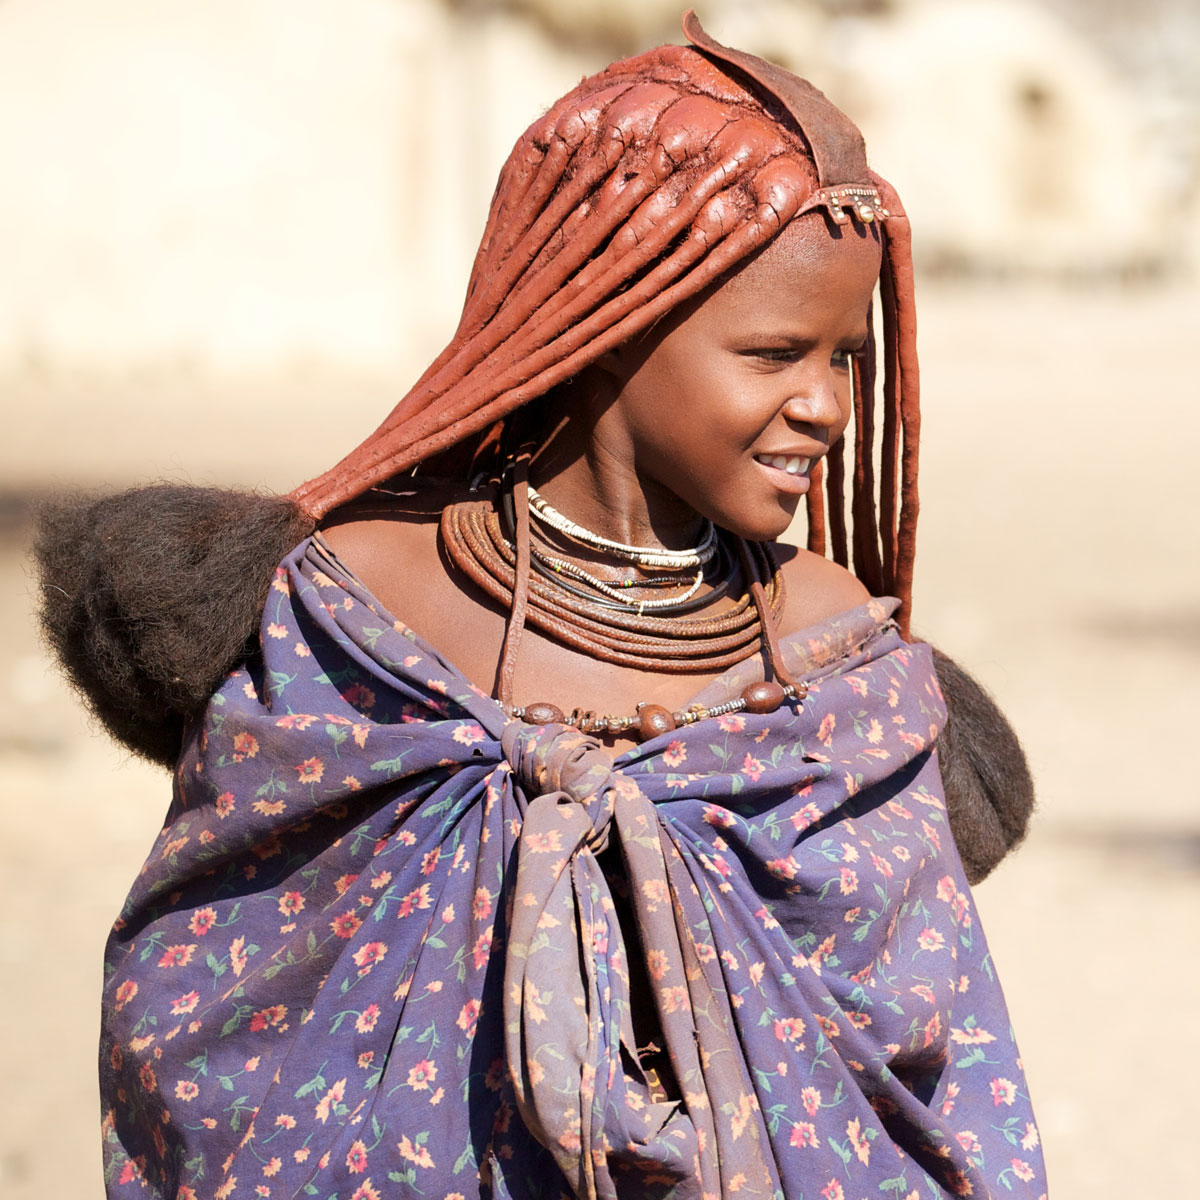 namibia_019_SP